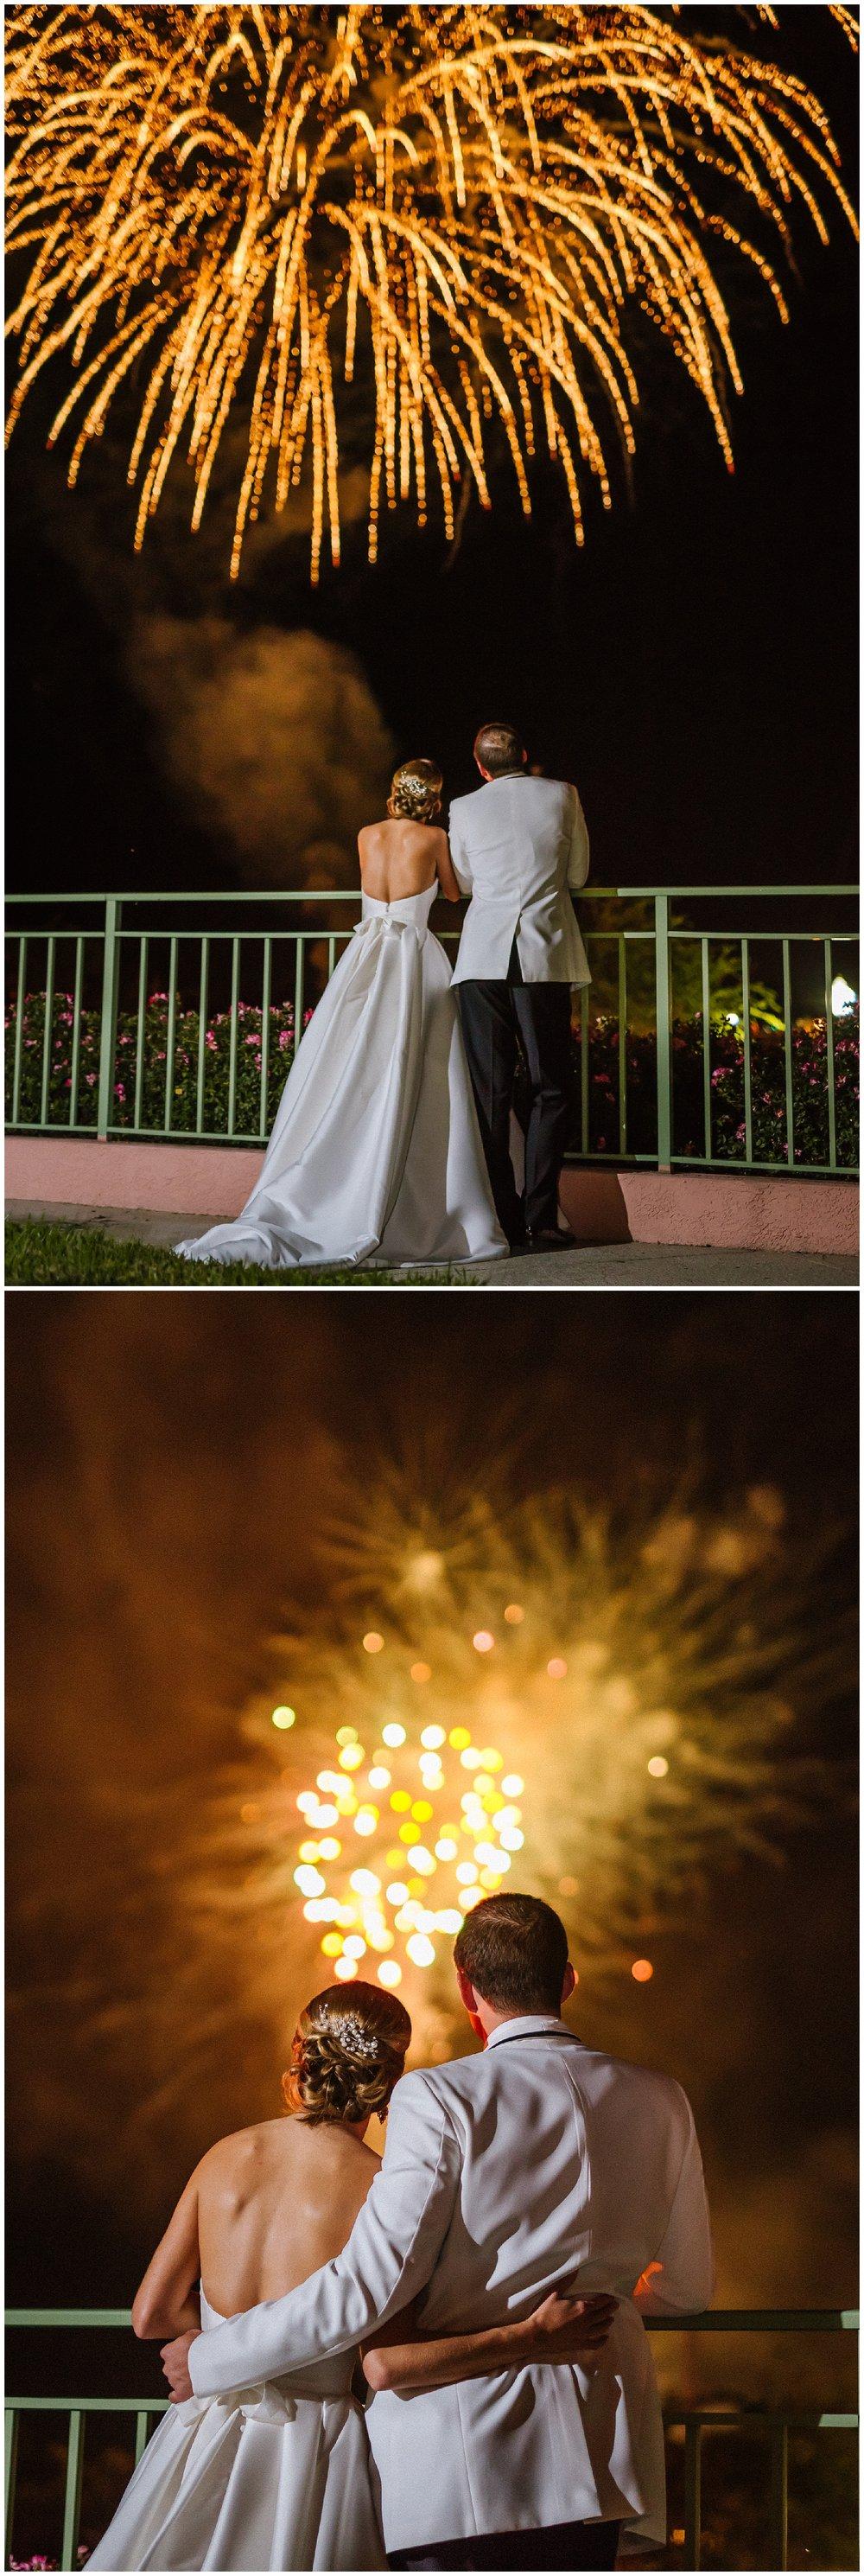 Ashlee-hamon-photography-year-in-review-2016-travel-wanderlust-vsco-adventure-wedding_0122.jpg